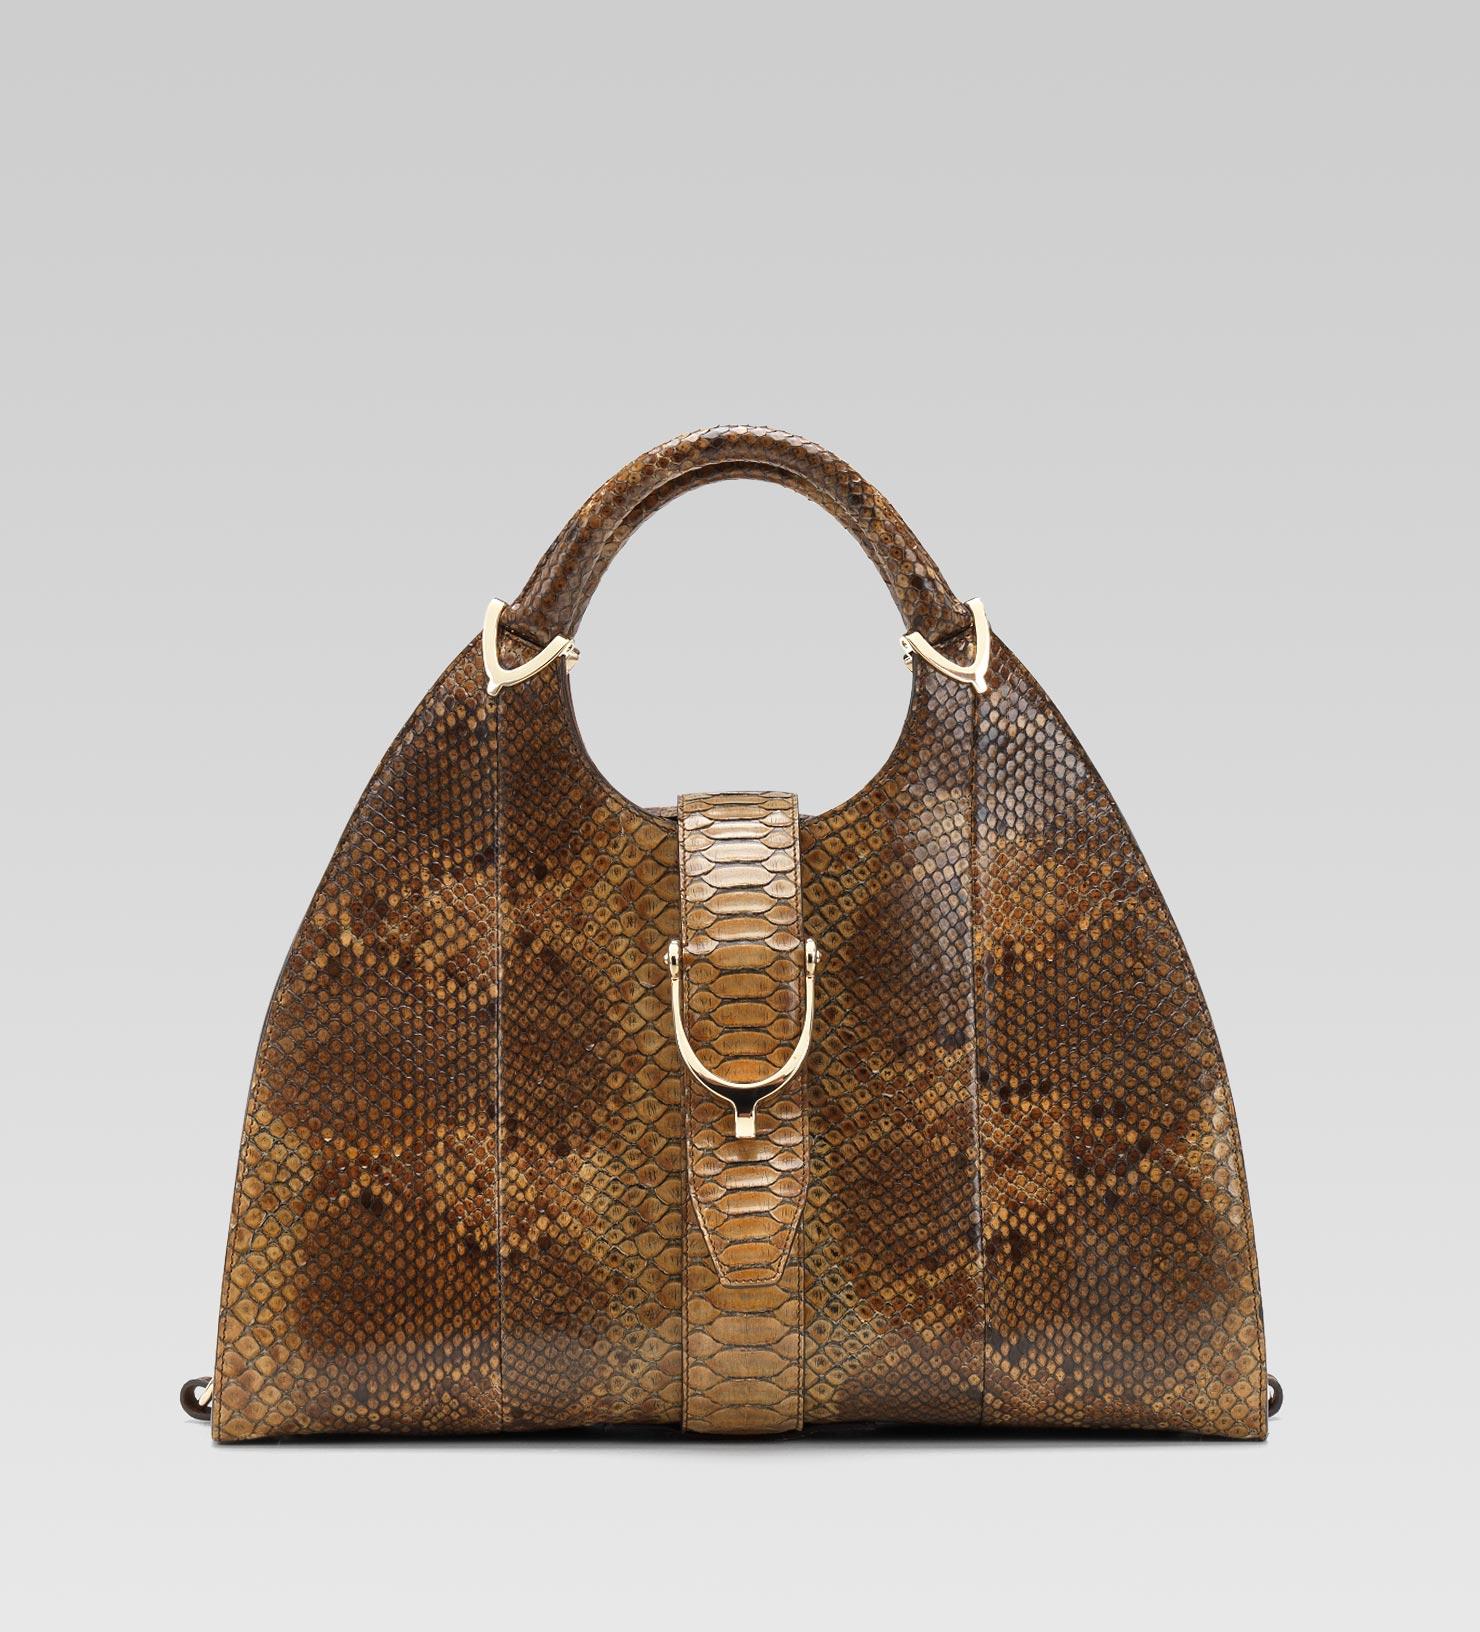 1f5776bafdaf Gucci Stirrup Brown Python Top Handle Bag in Brown - Lyst